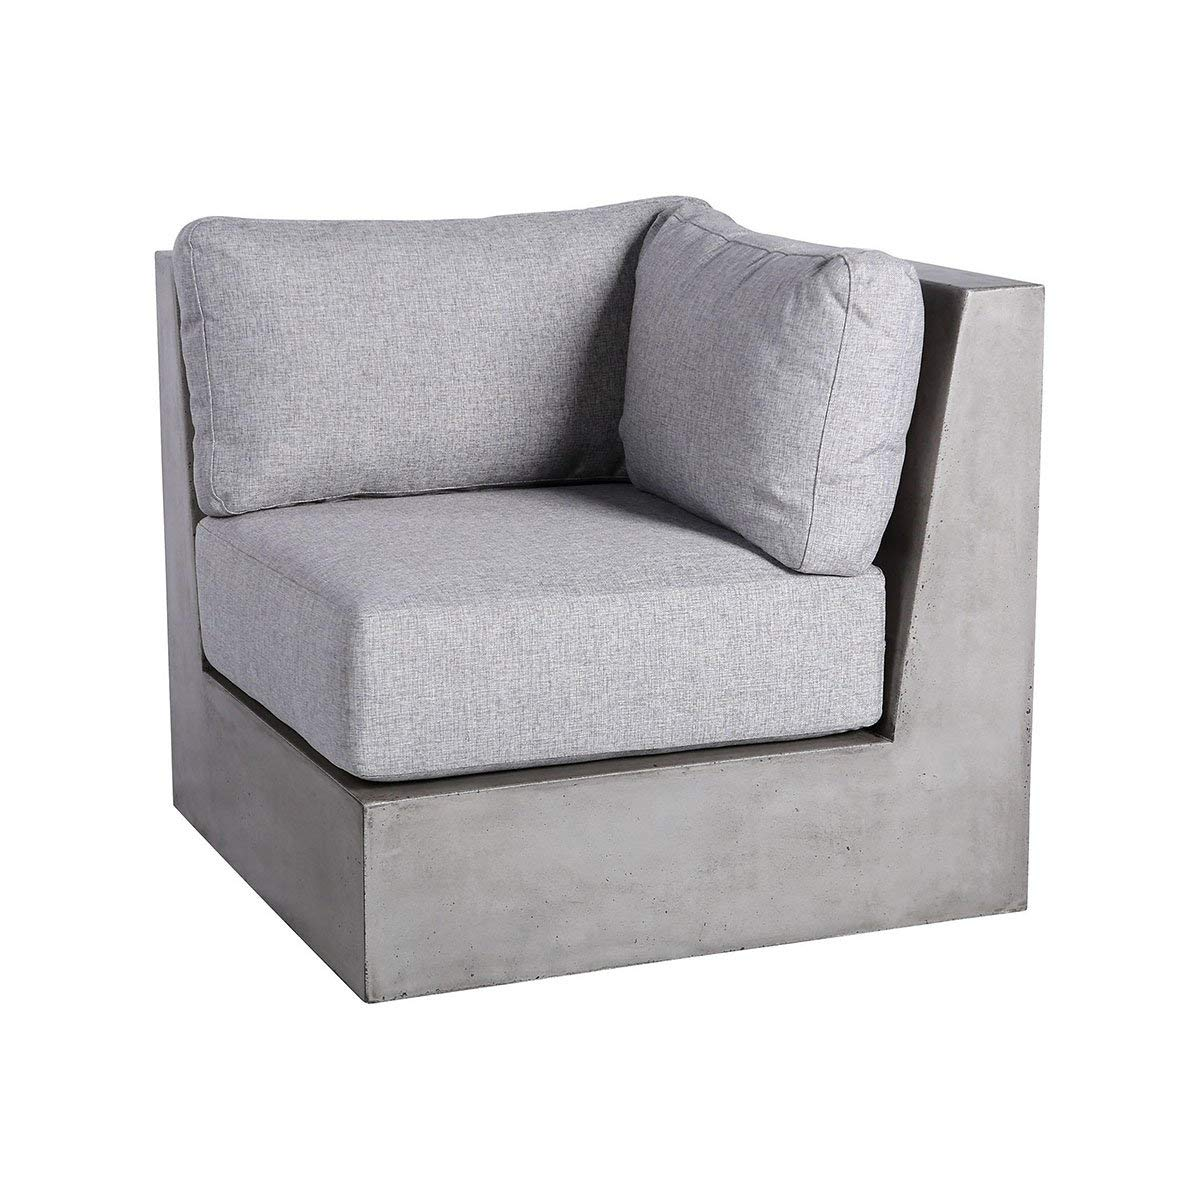 Cheap Corner Unit Sofa Bed, find Corner Unit Sofa Bed deals on line ...